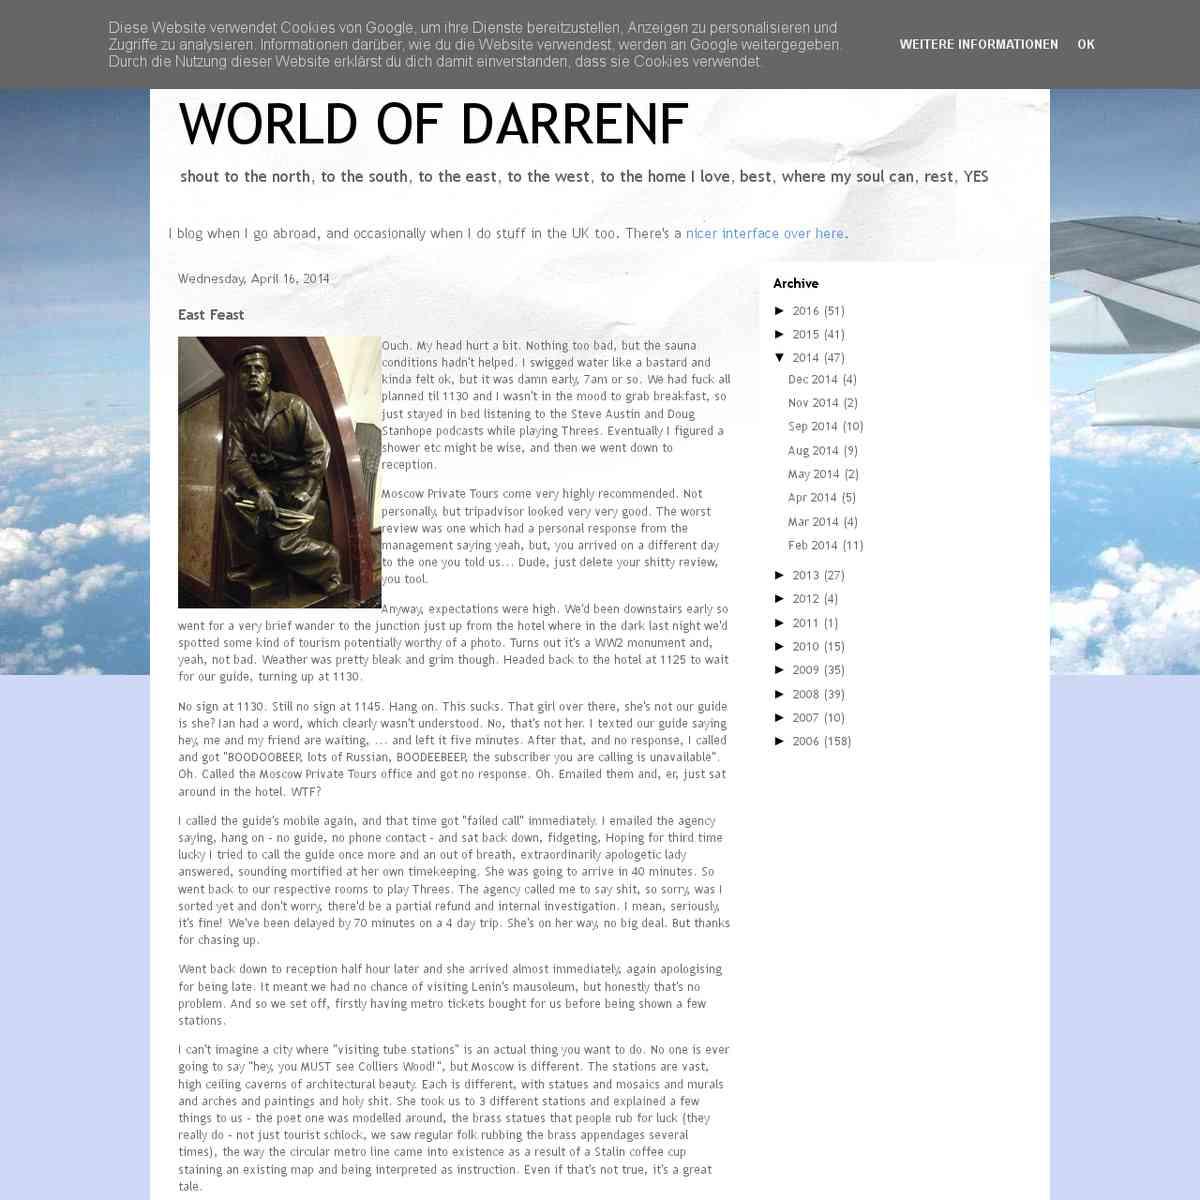 blog.darrenf.org/2014/04/east-feast.html